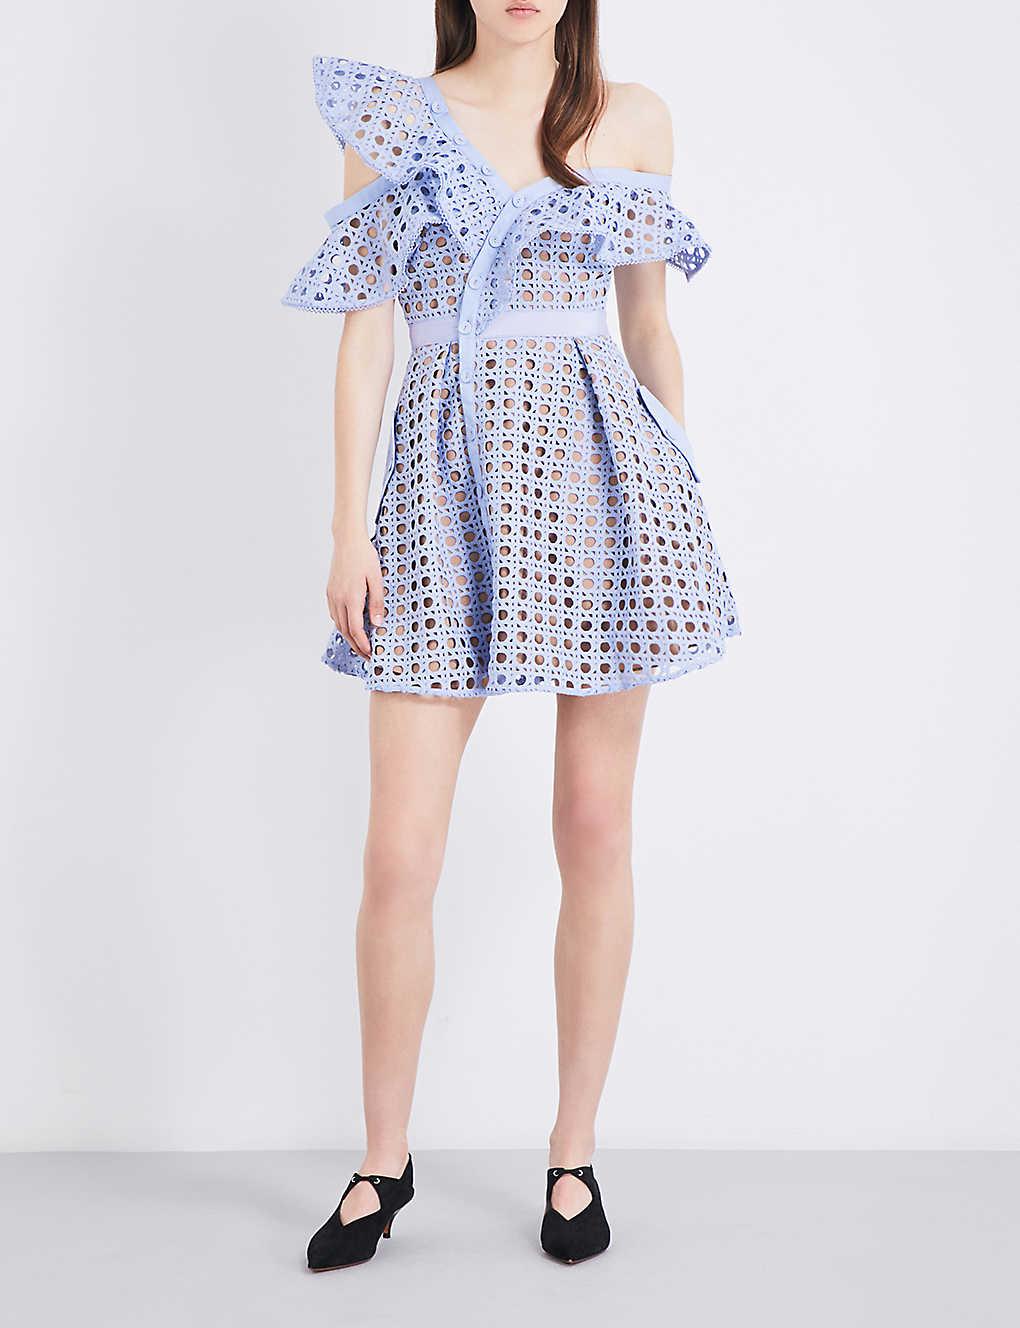 Christmas dress attire for age 57 - Self Portrait Guipure Frill Mini Dress